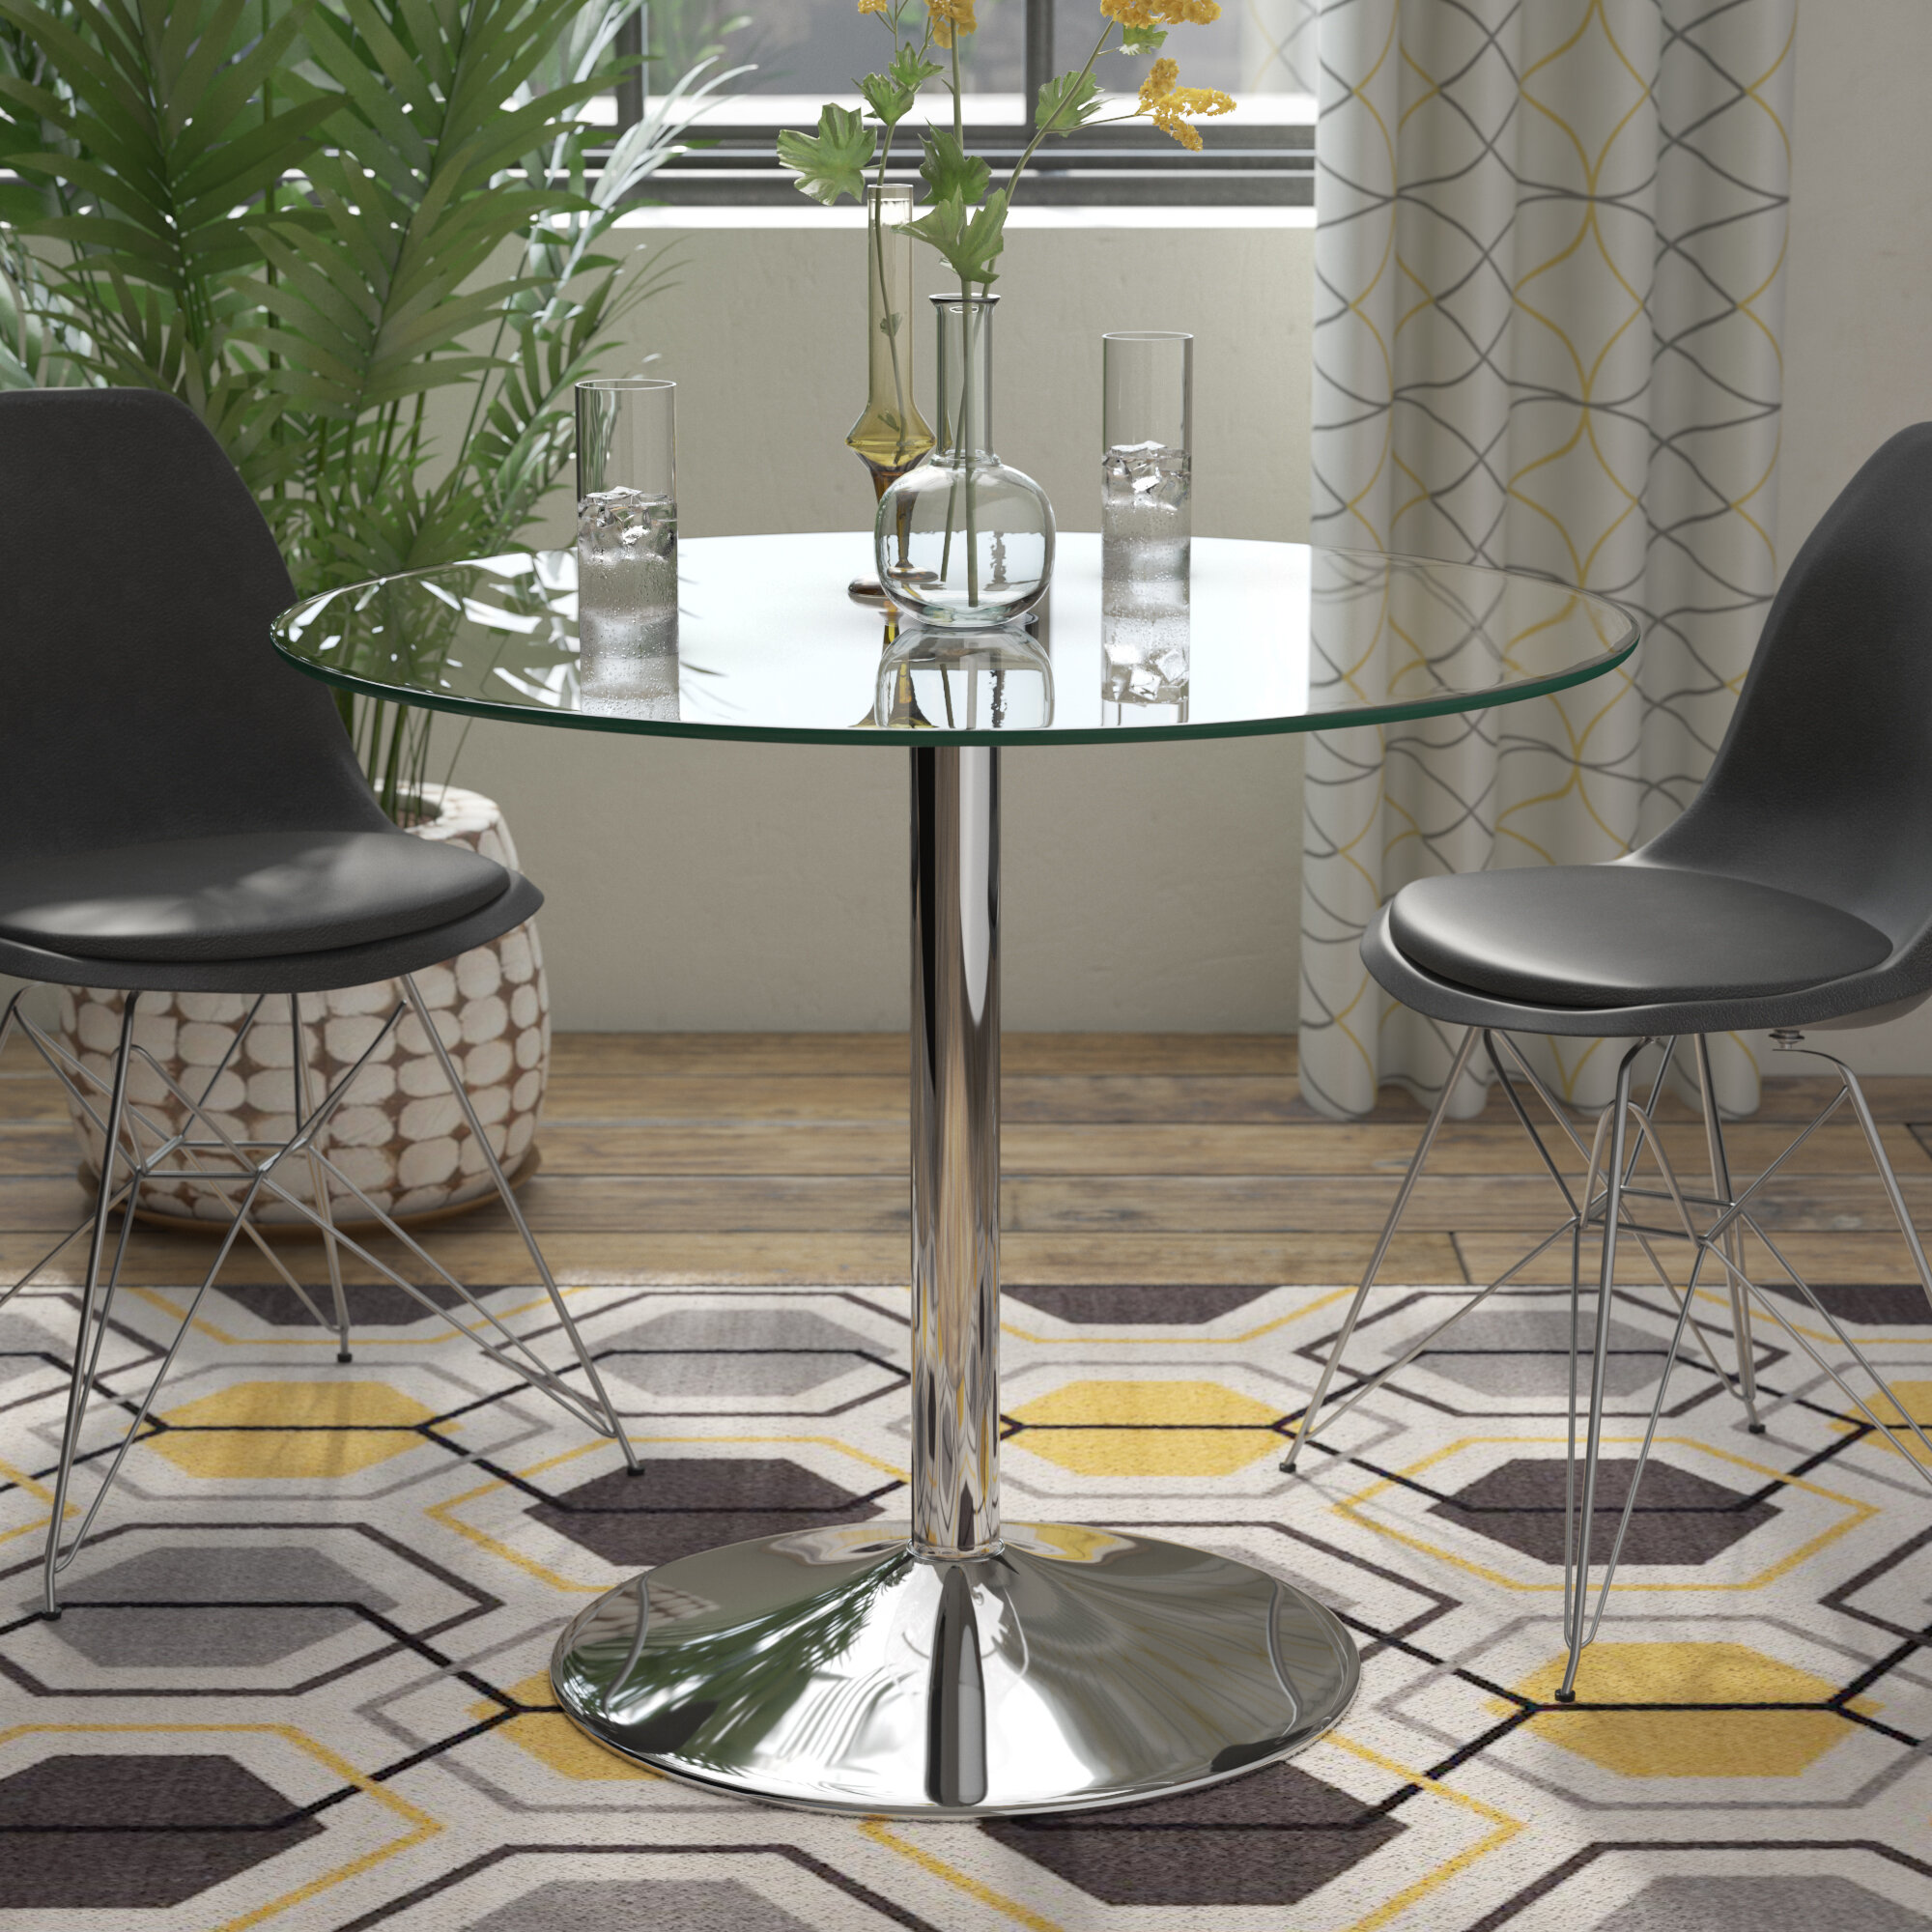 fab0a2c5ece3e Zipcode Design Ember Dining Table   Reviews